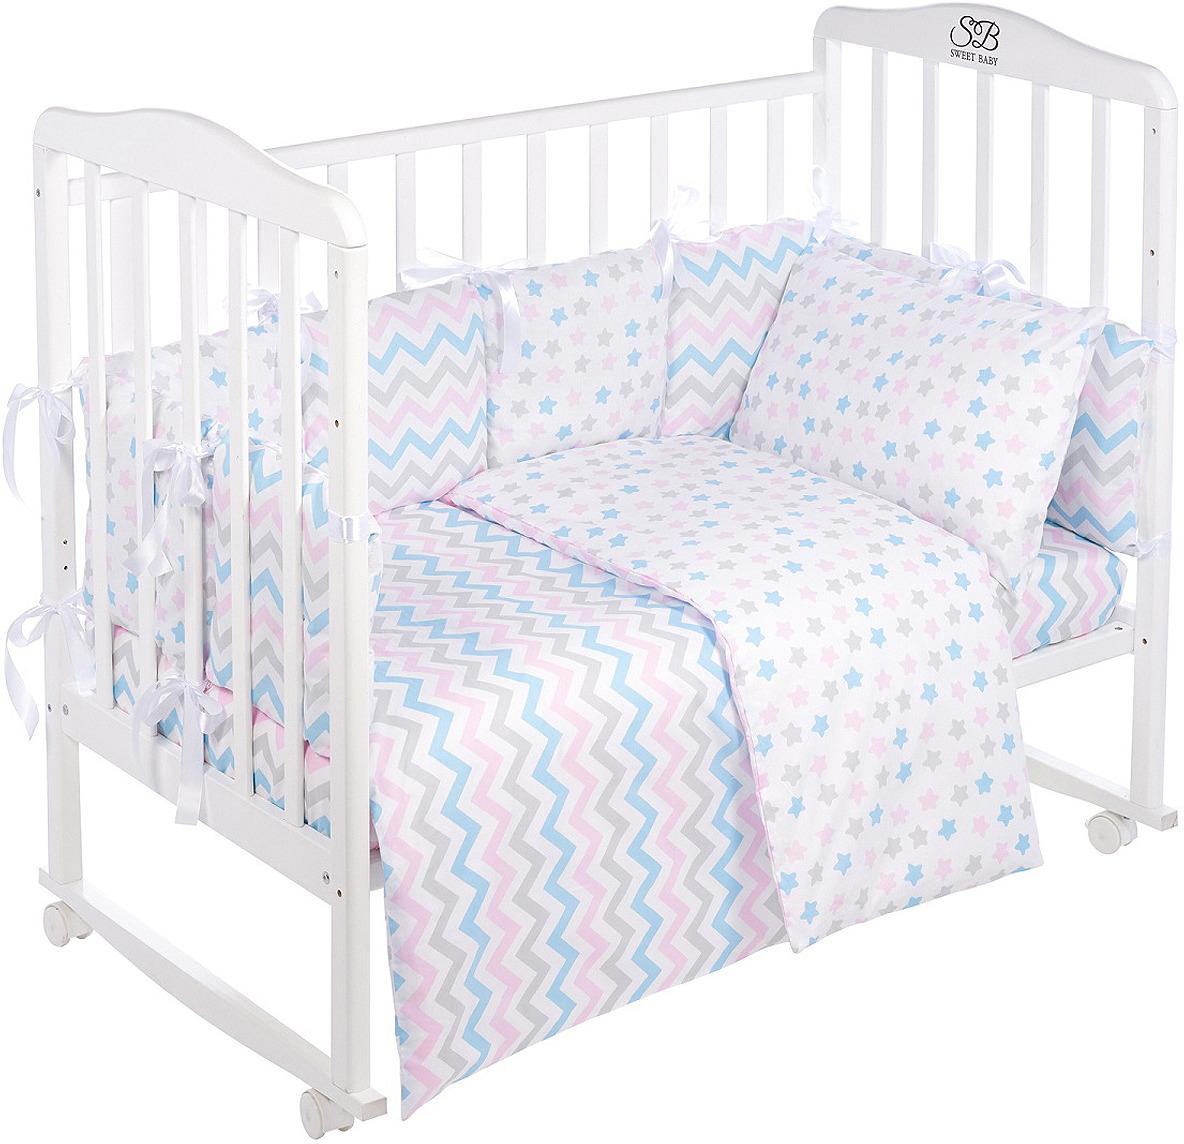 Комплект в кроватку Sweet Baby Colori Bianco, 420975, белый, 4 предмета